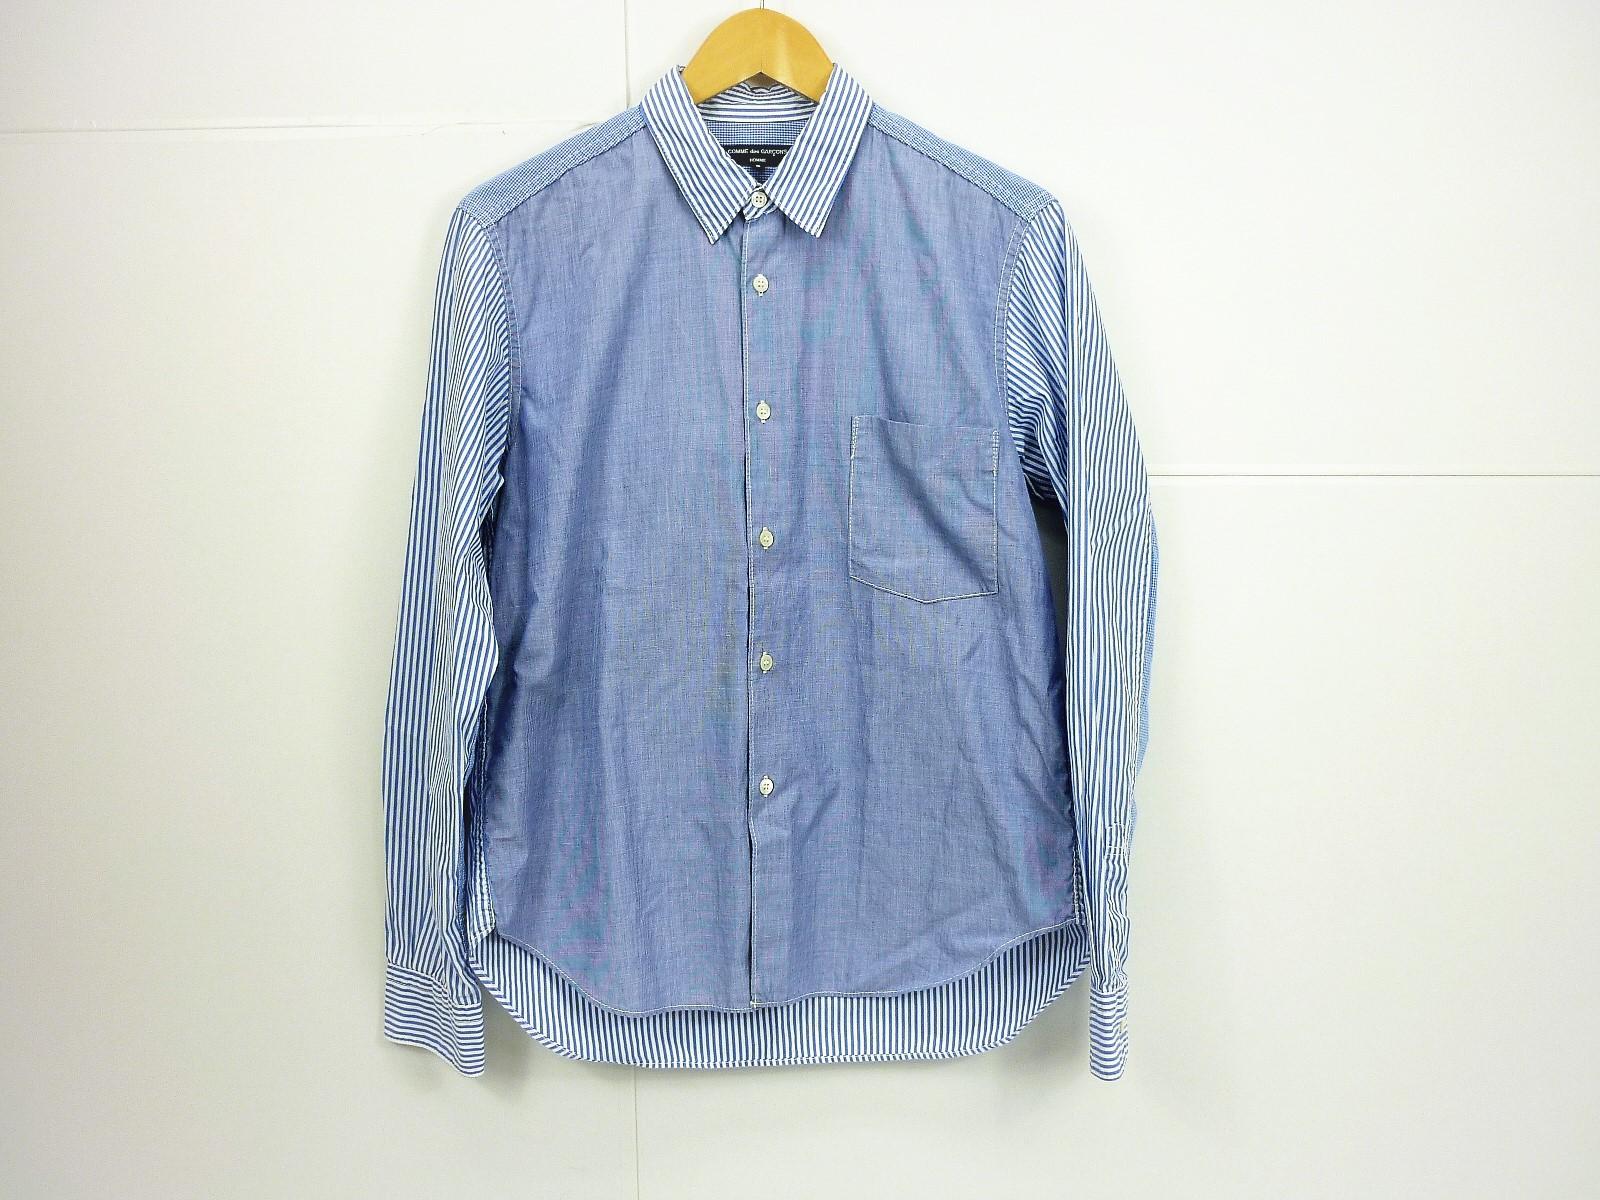 COMME des GARCONS HOMME マルチストライプパッチワークシャツ size:S コムデギャルソンオム ブルー ギンガムチェック